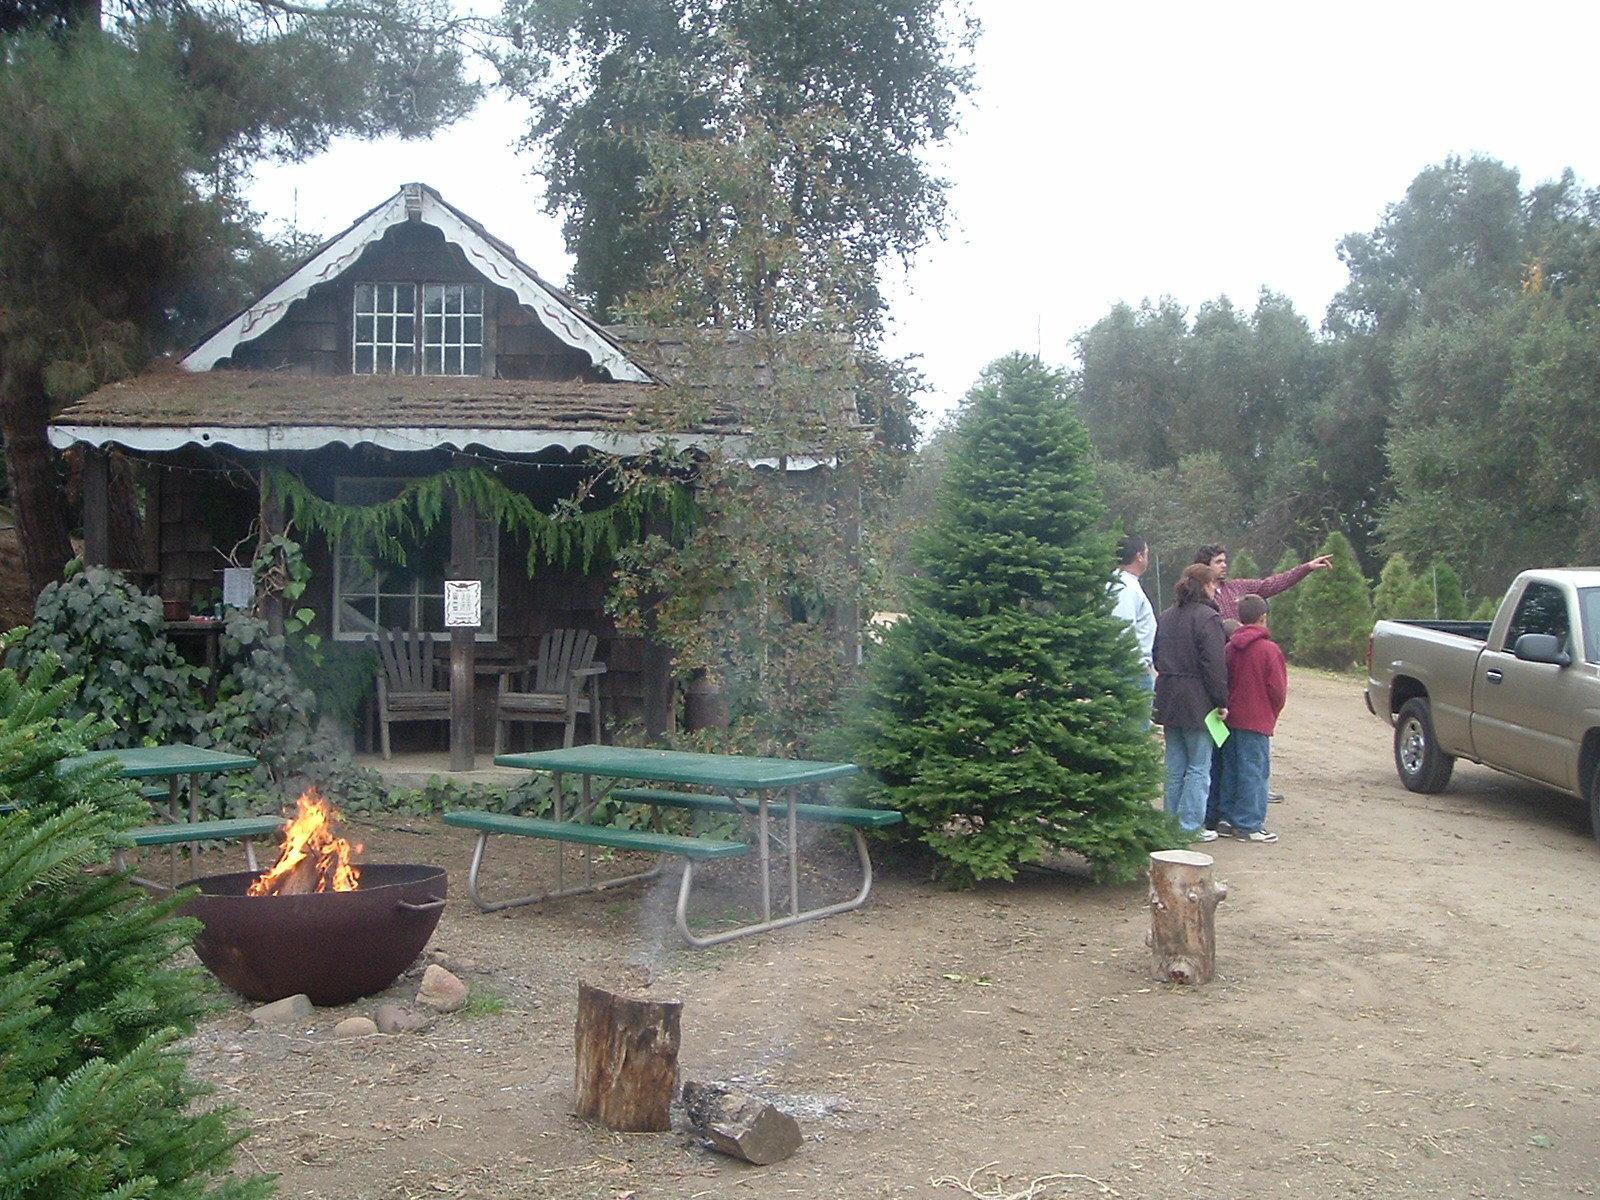 Hillcrest Christmas Tree Farm And Pumpkin Patch   Reedley, California